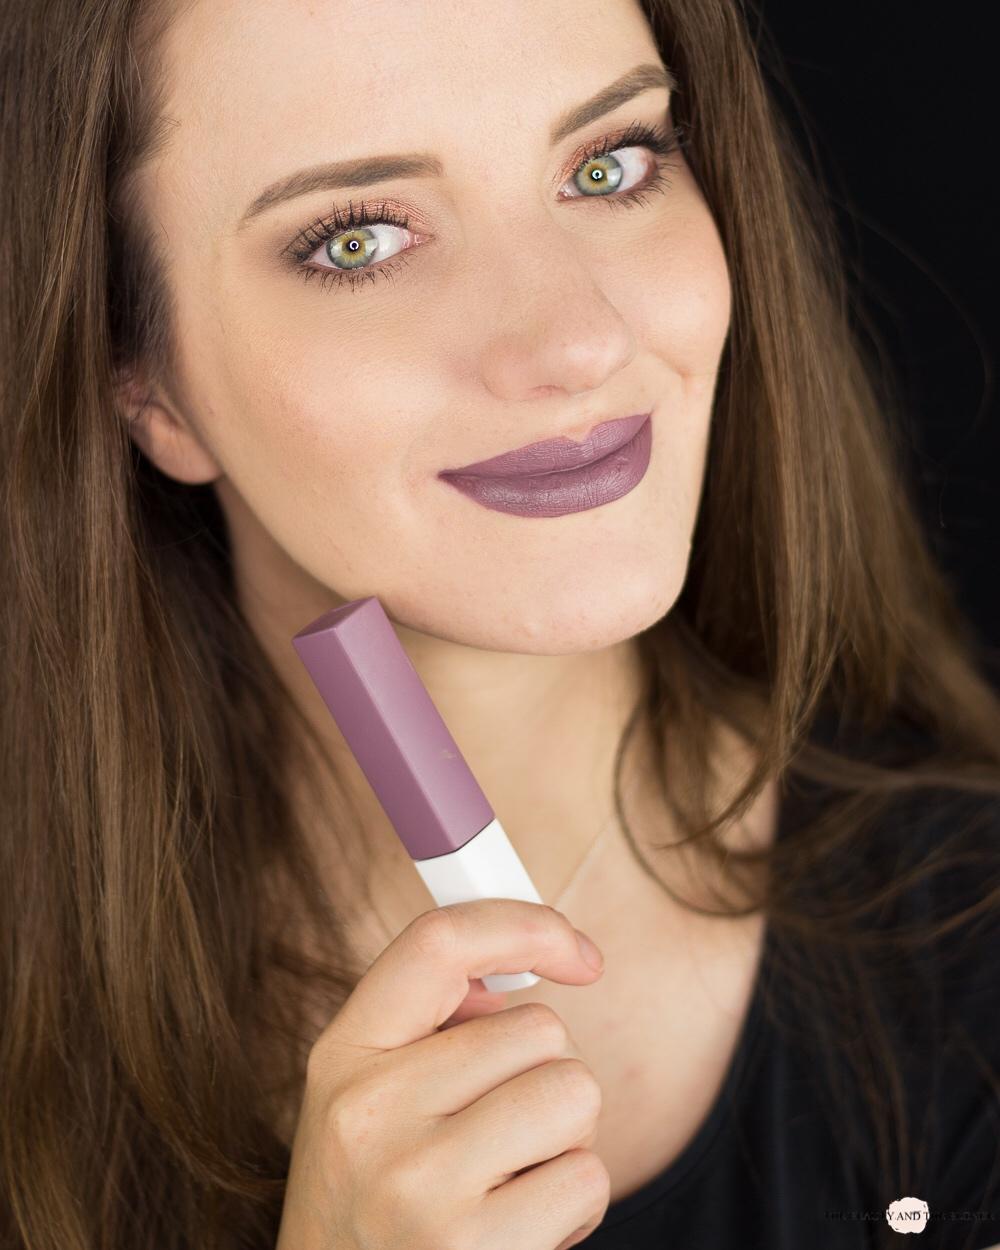 Maybelline Super Stay Matte Ink Visionary Tragebild Lipswatch Review